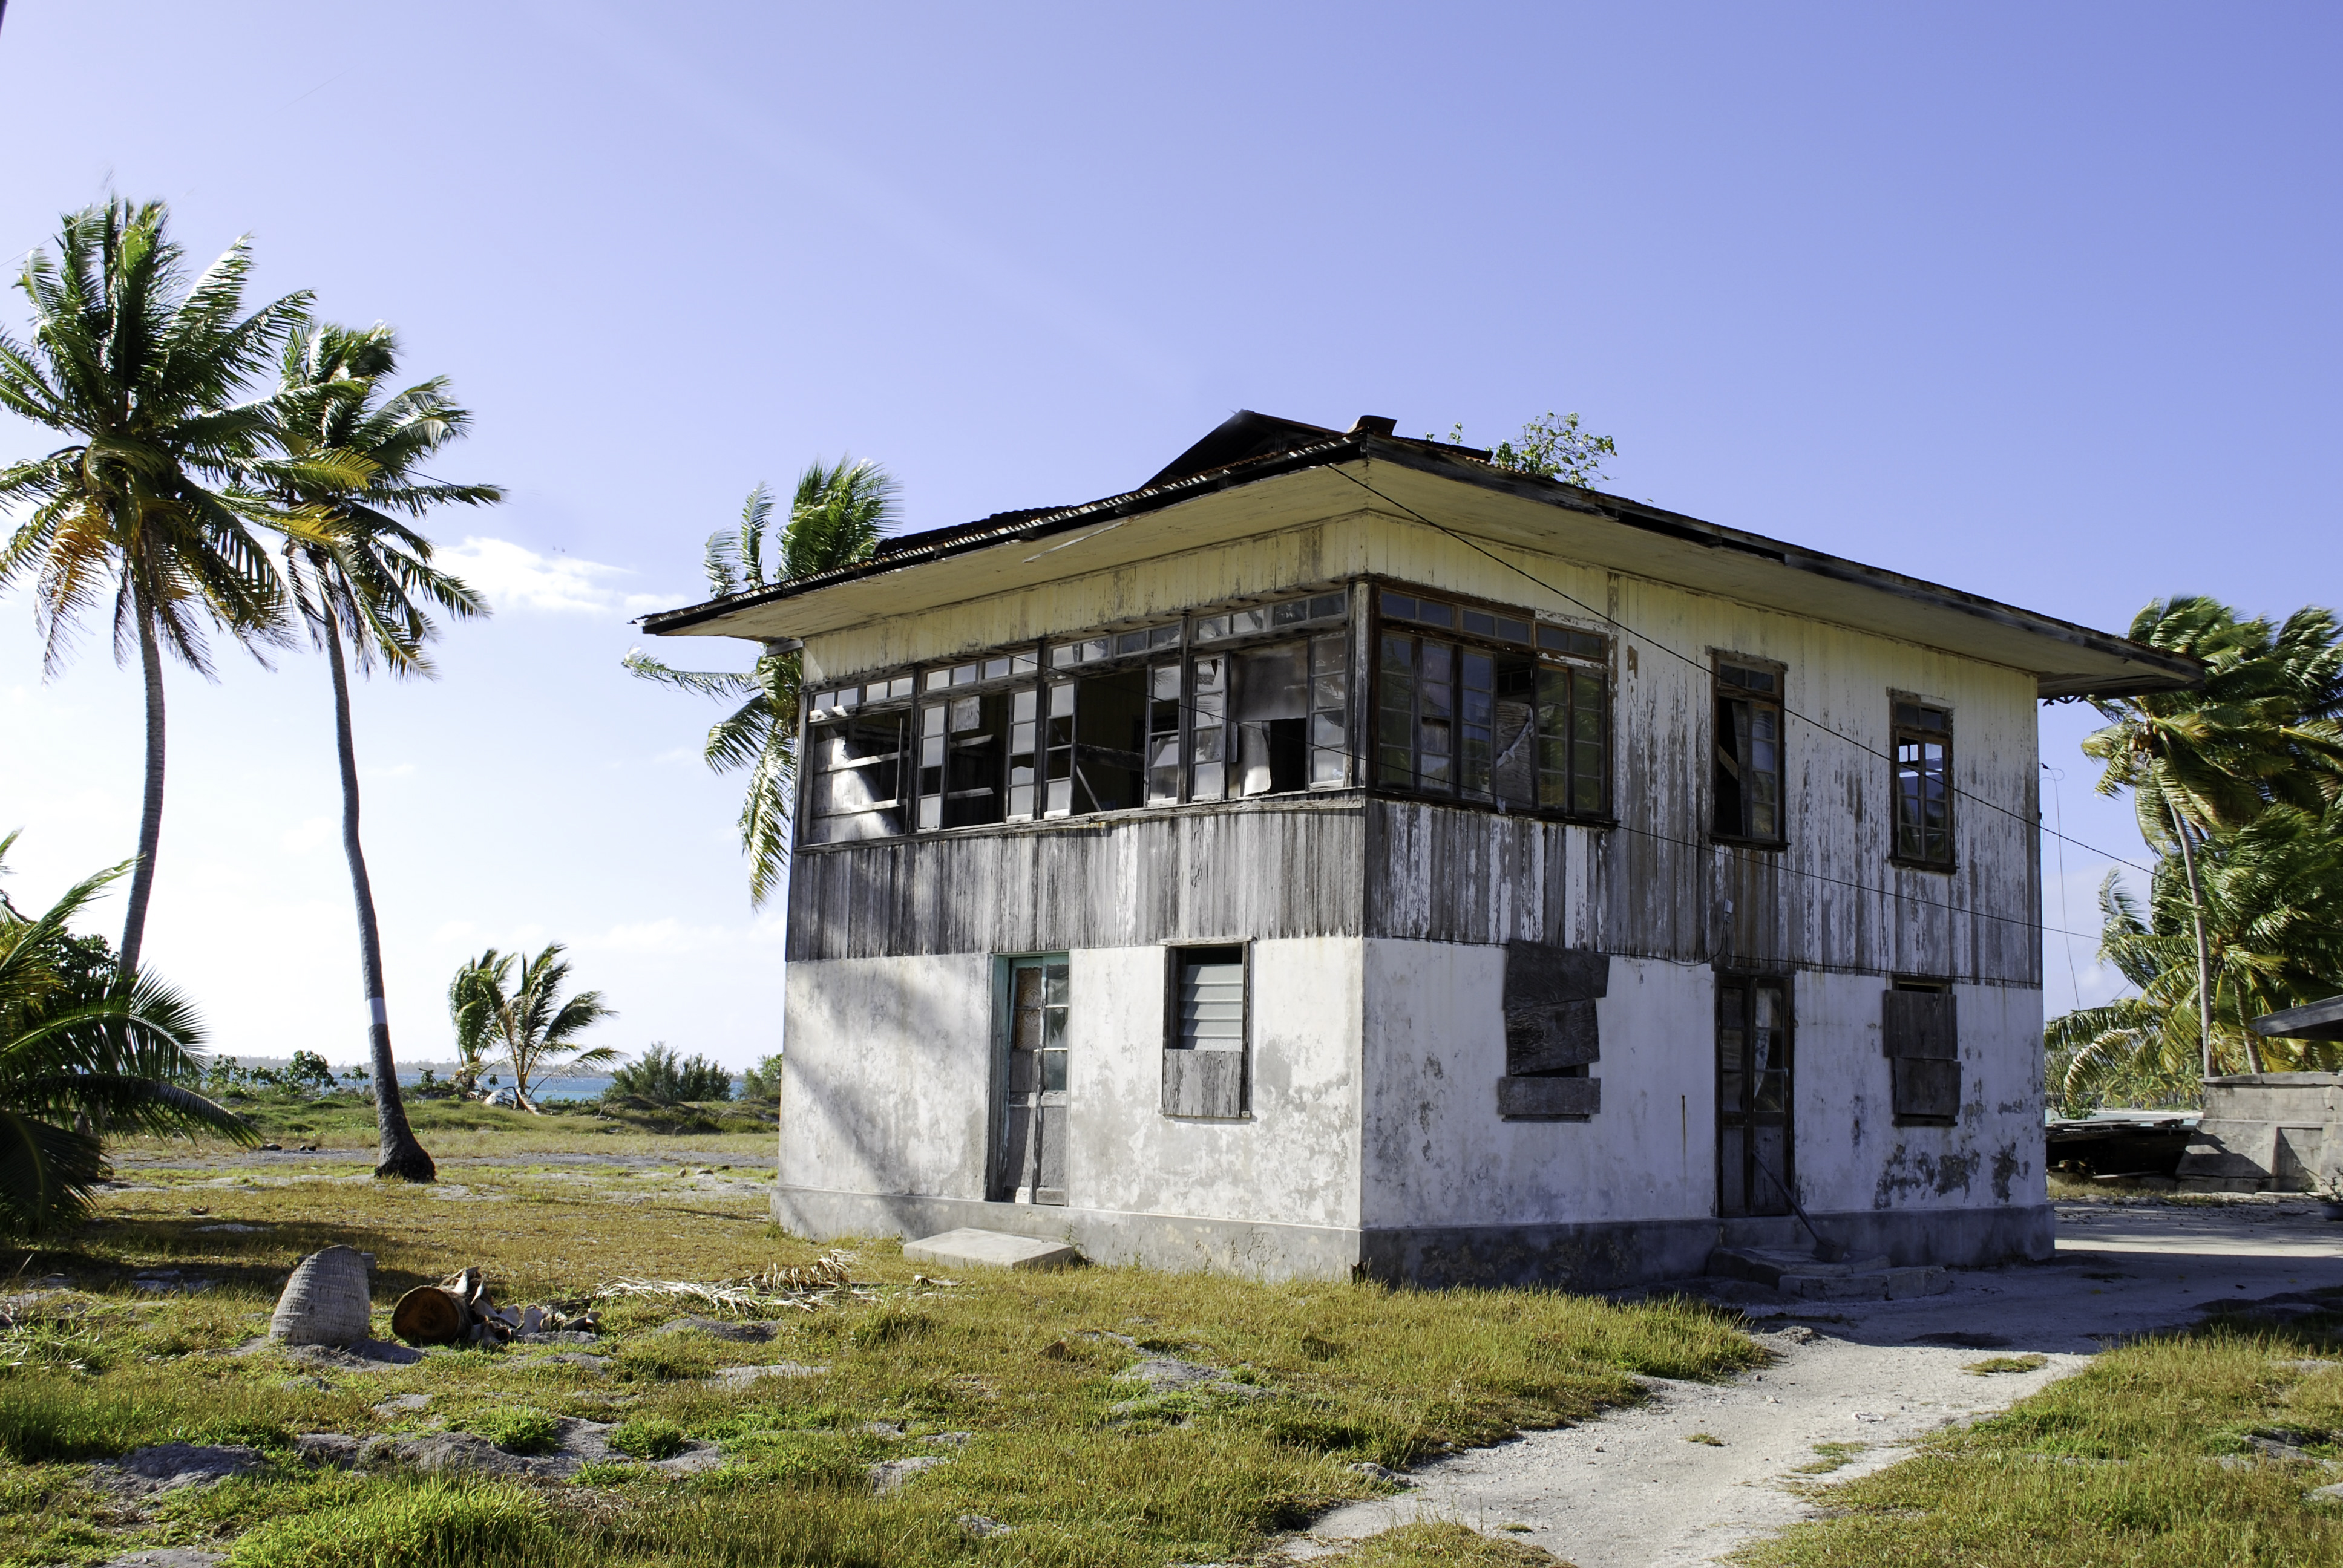 Maison à  Fakahina . Photo d'illustration.